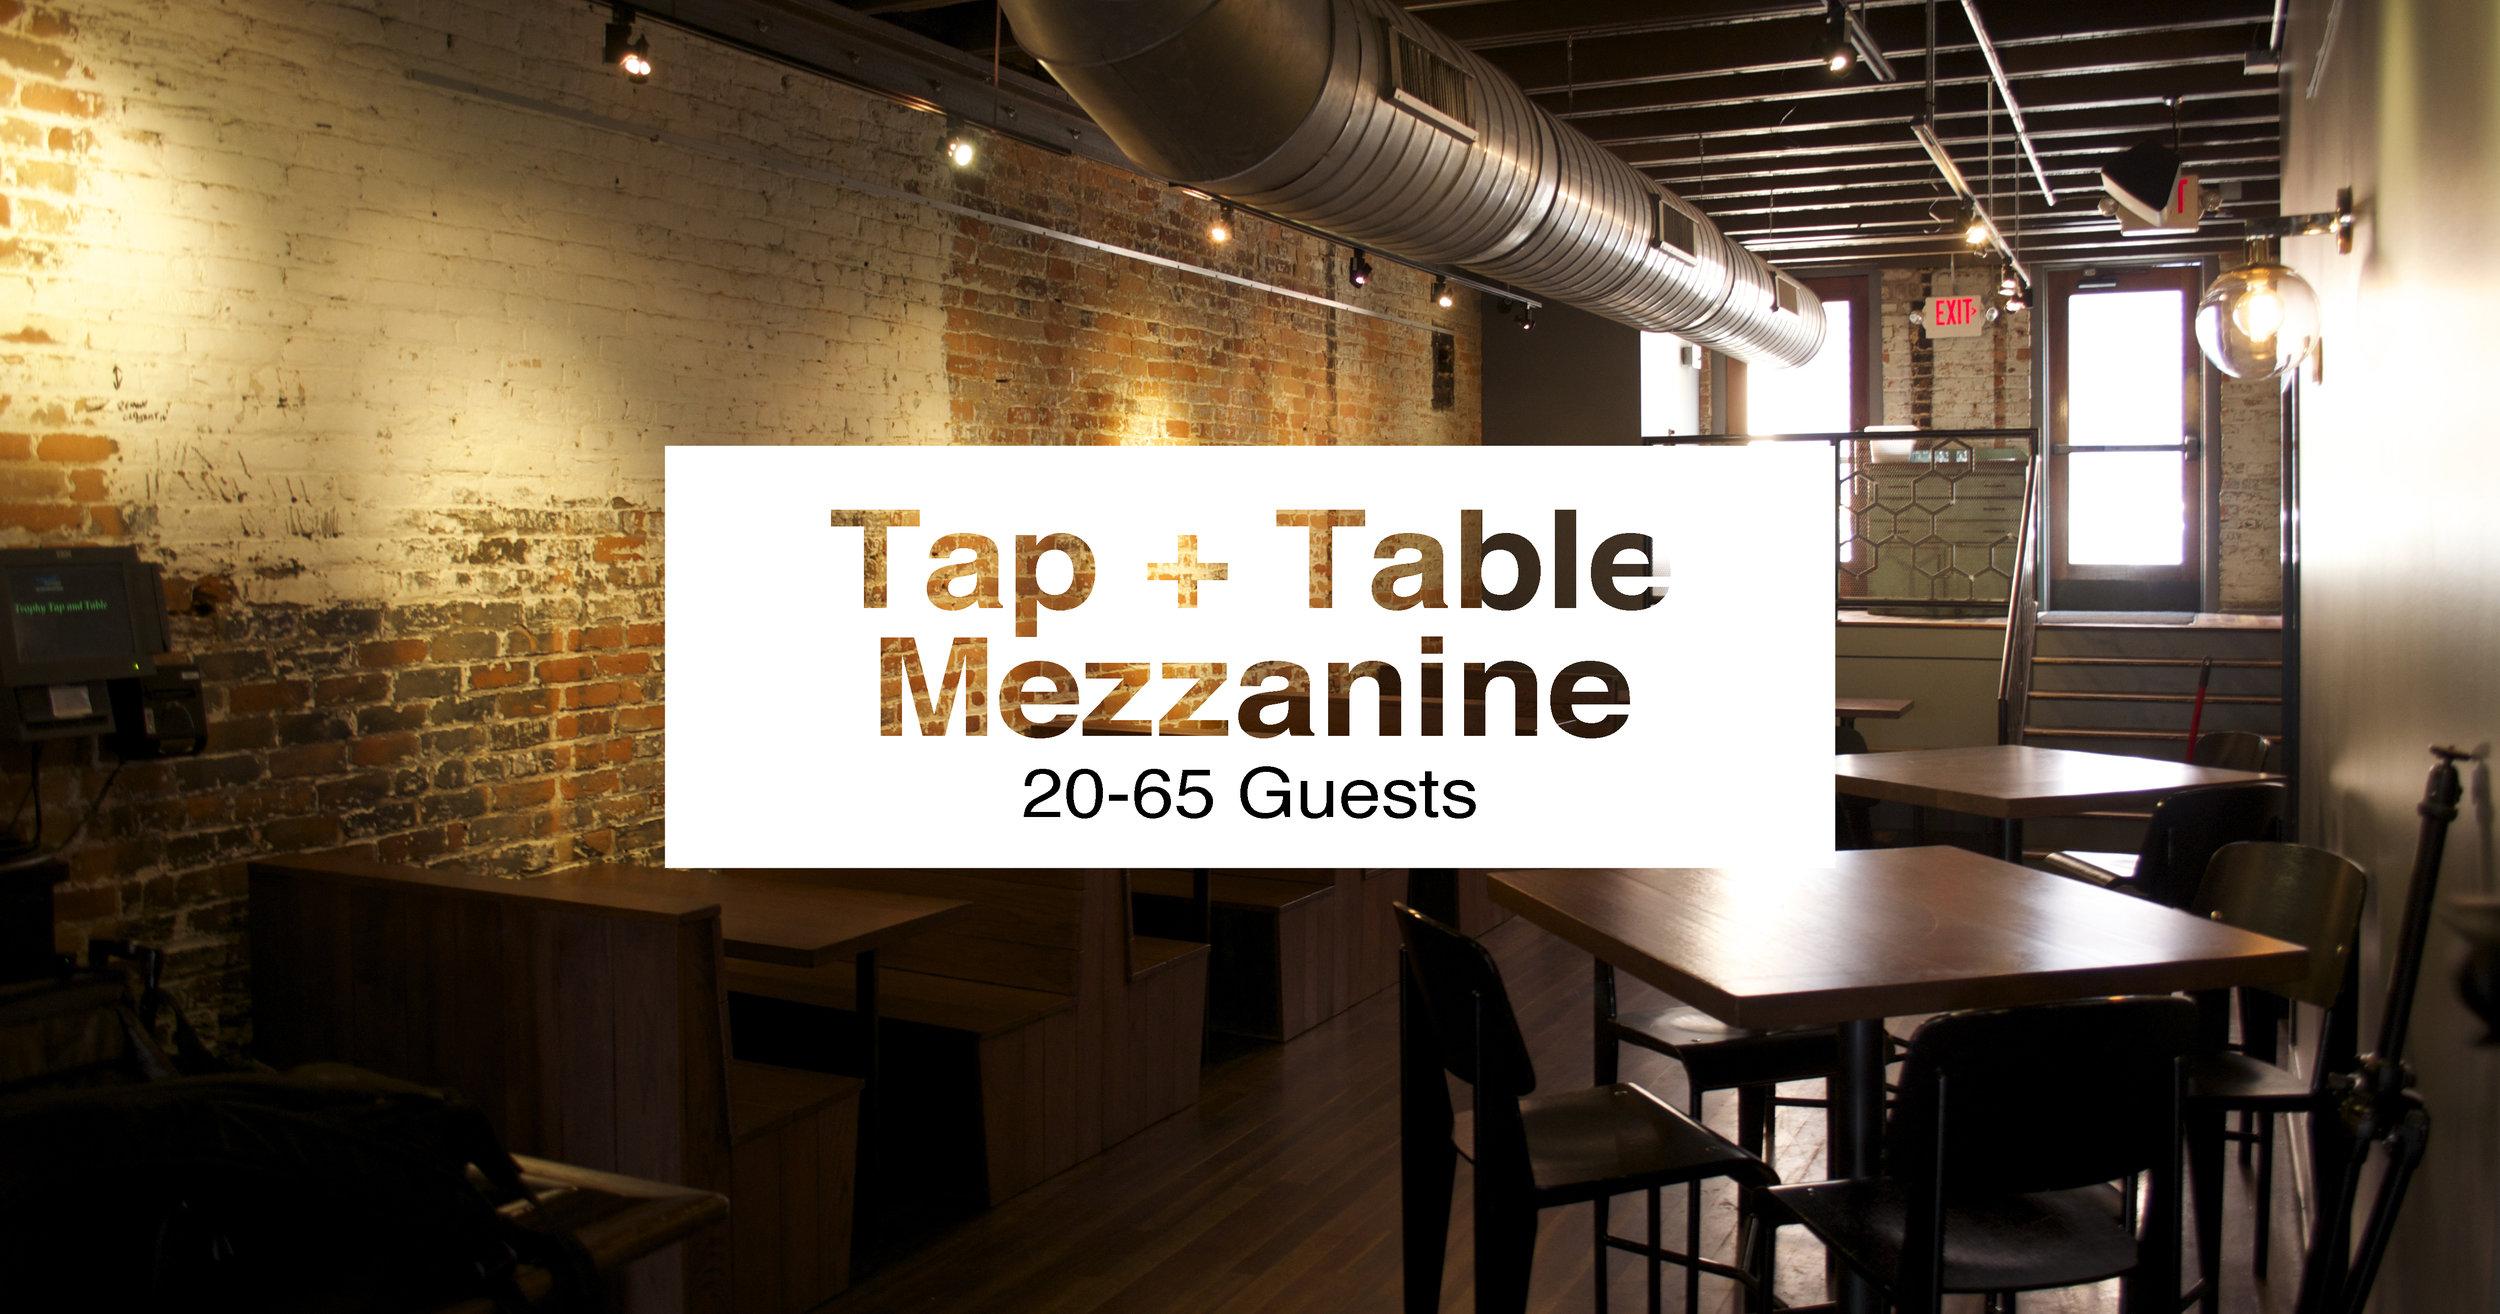 Tap + Table Mezzanine